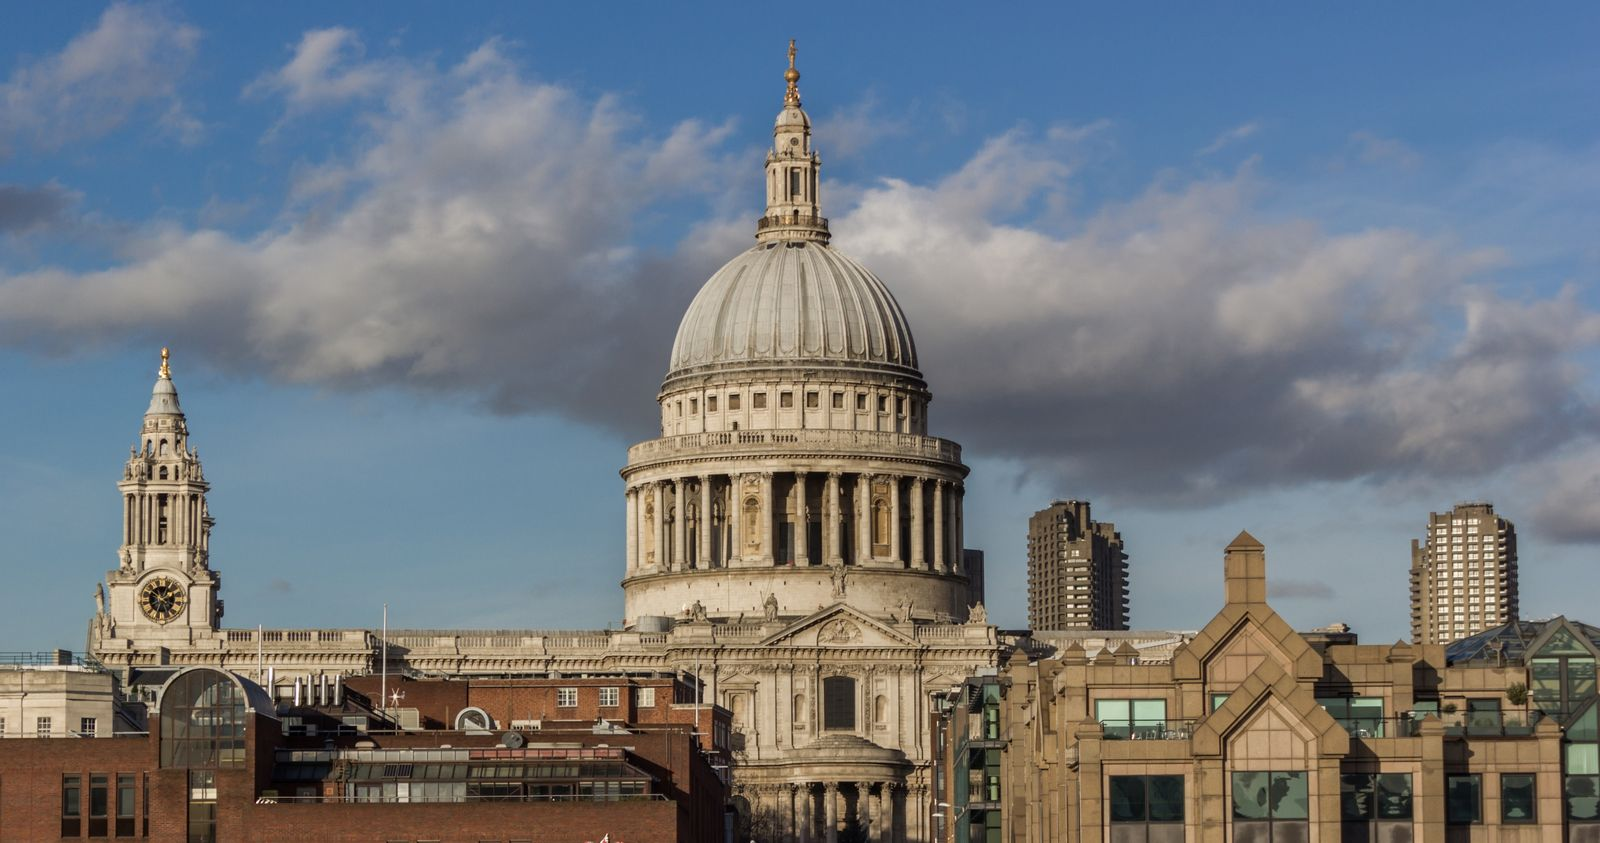 La cúpula de St. Paul's